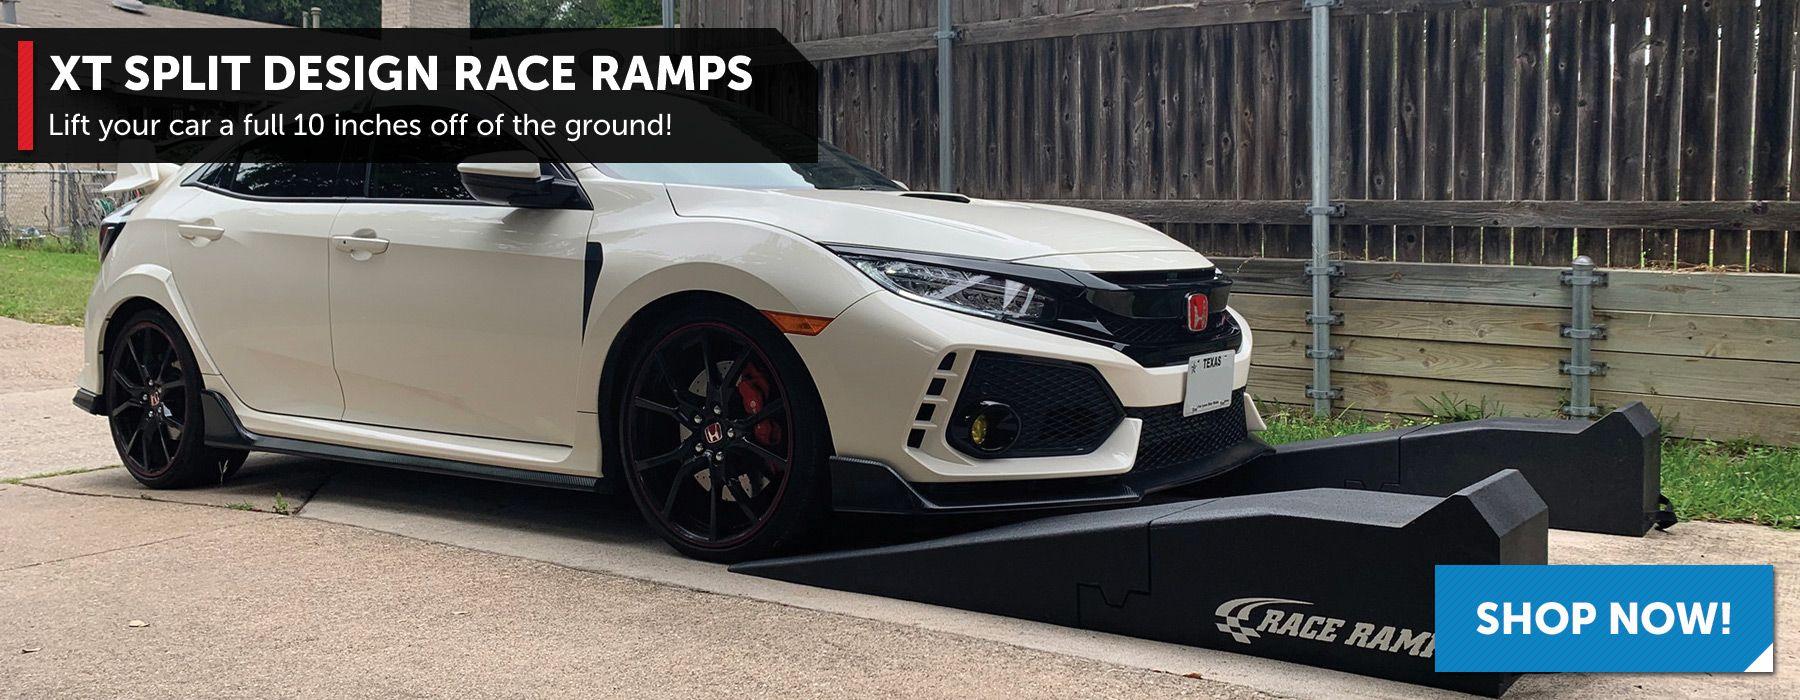 Shop XT Race Ramps